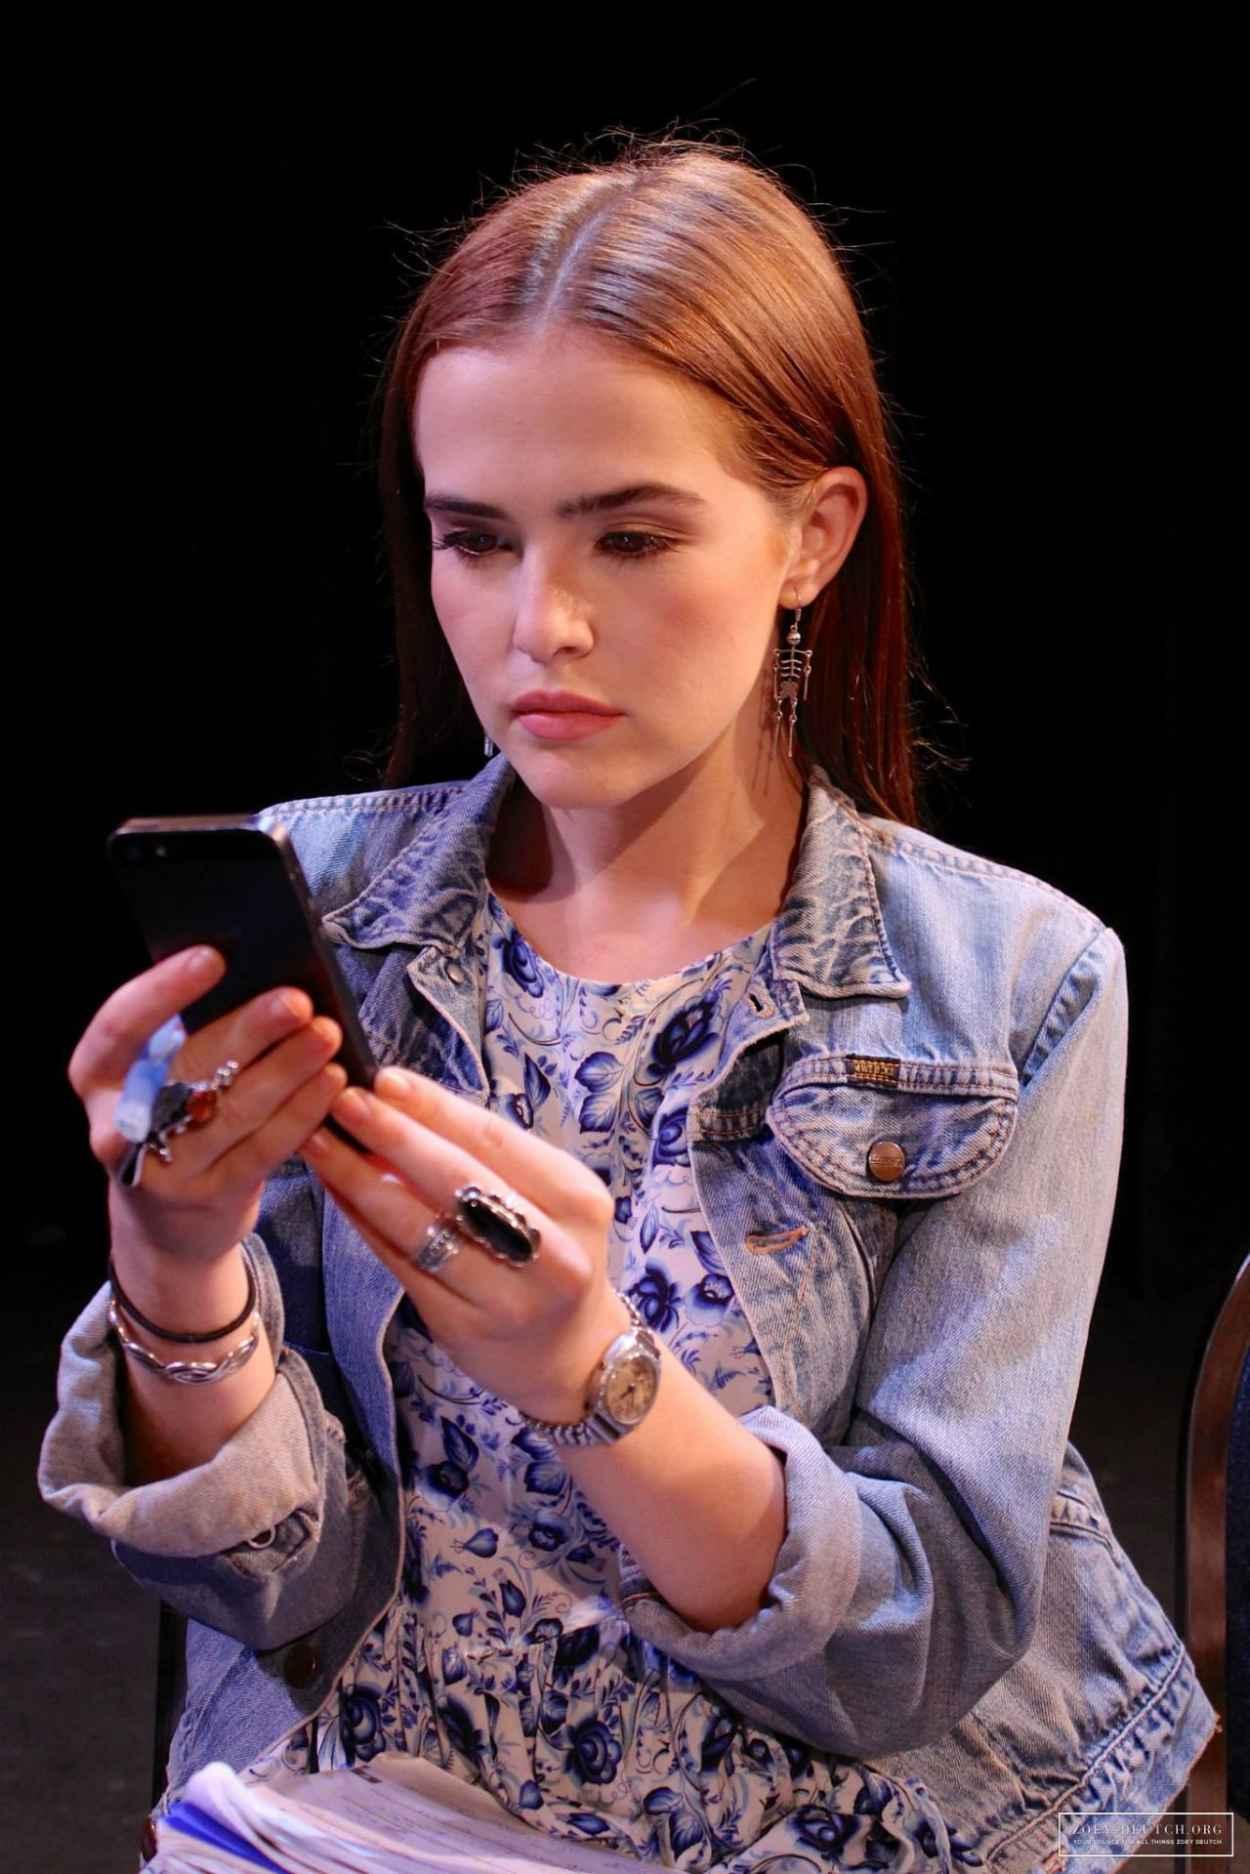 Zoey Deutch - Performing on Stage - Barophobia 2015-1